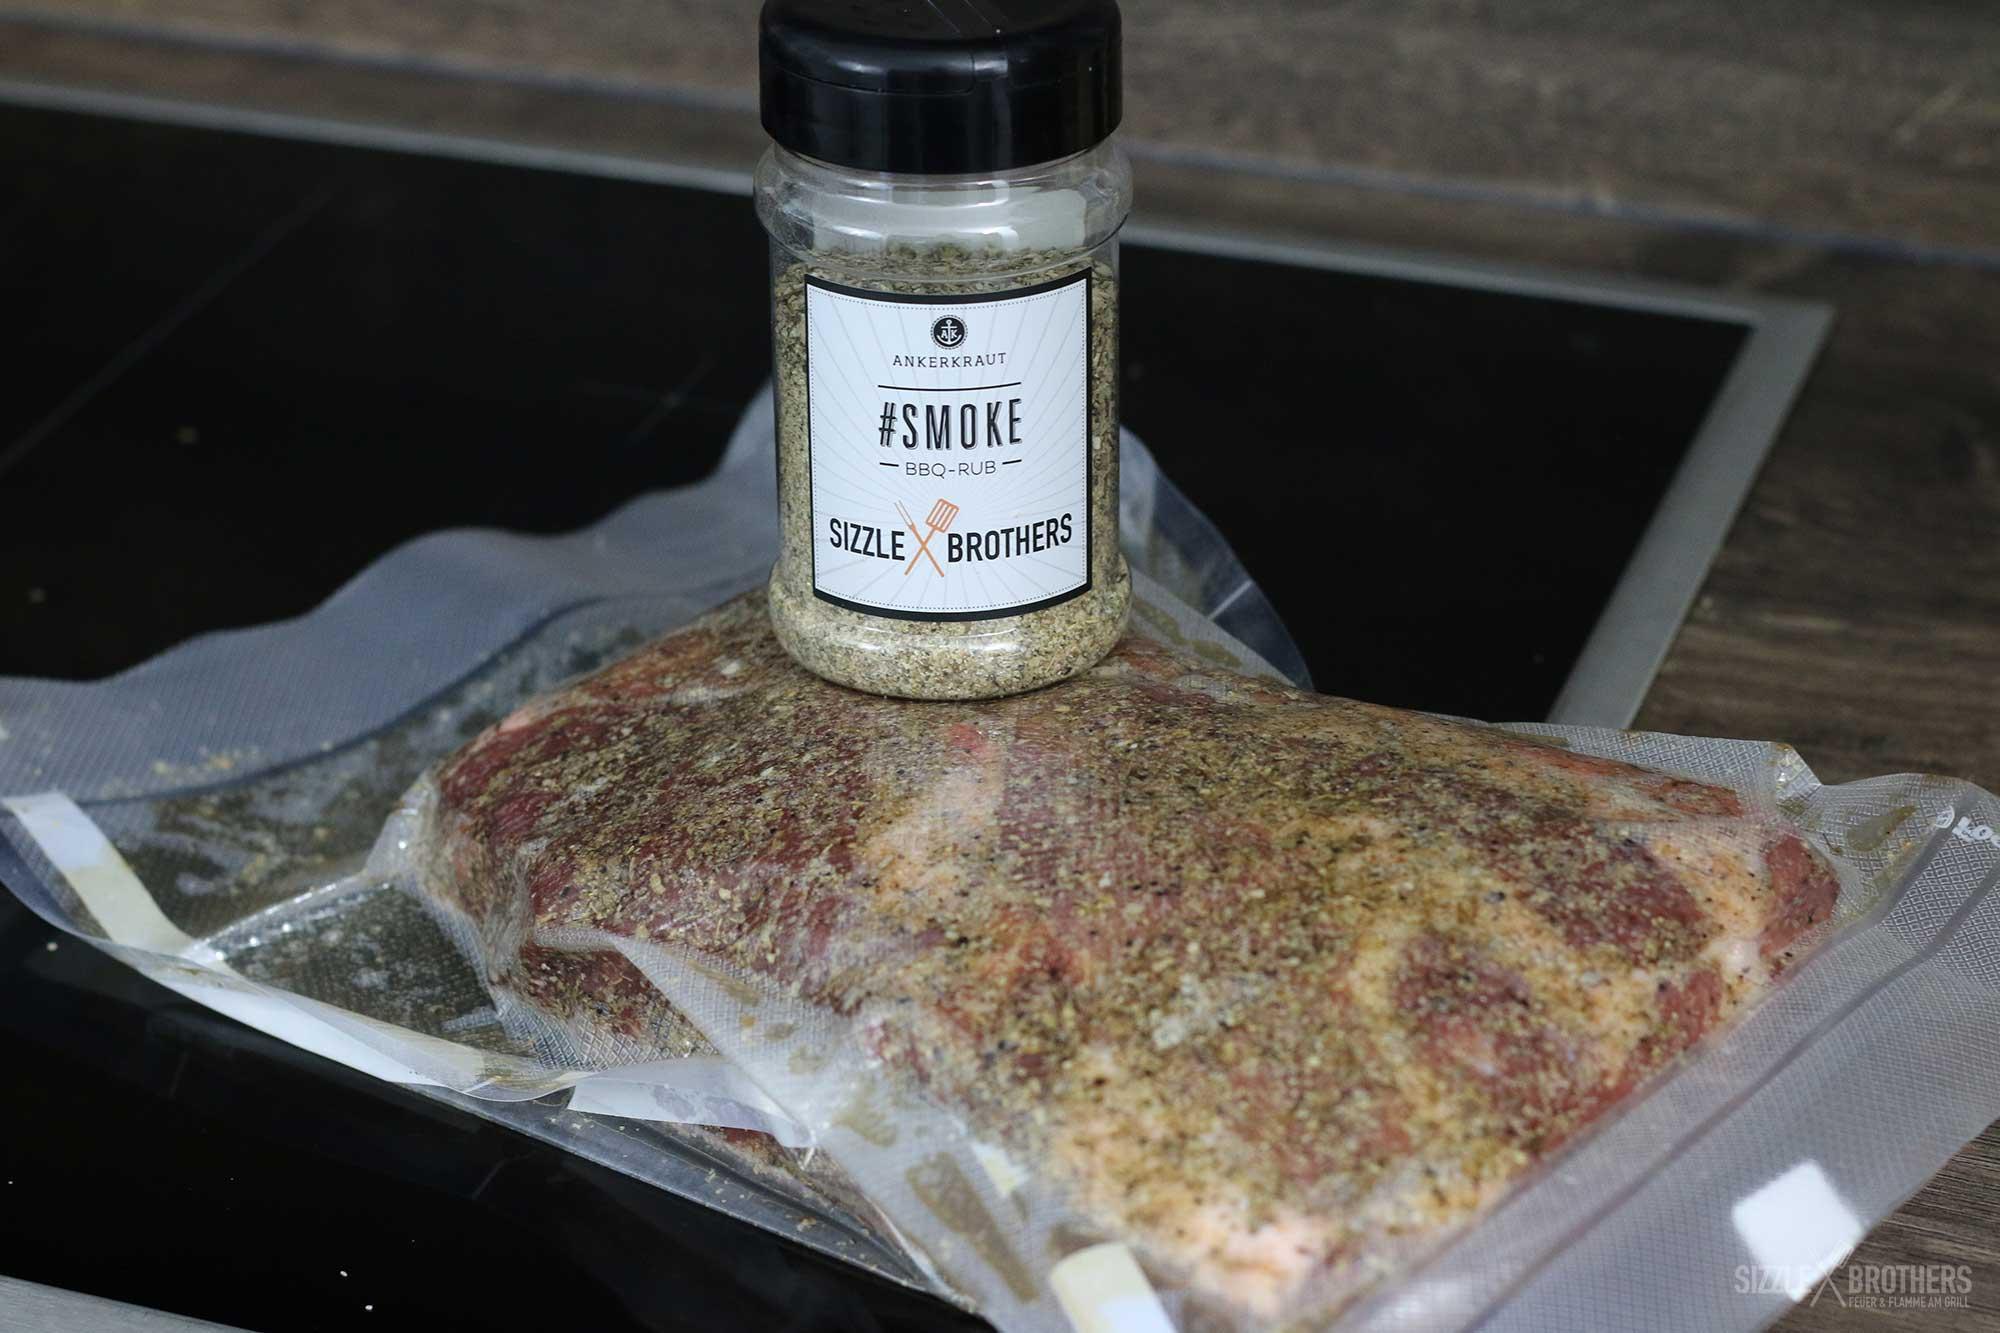 Fertig Pulled Pork Gasgrill : Pulled pork sous vide gegart immer püntklich fertig